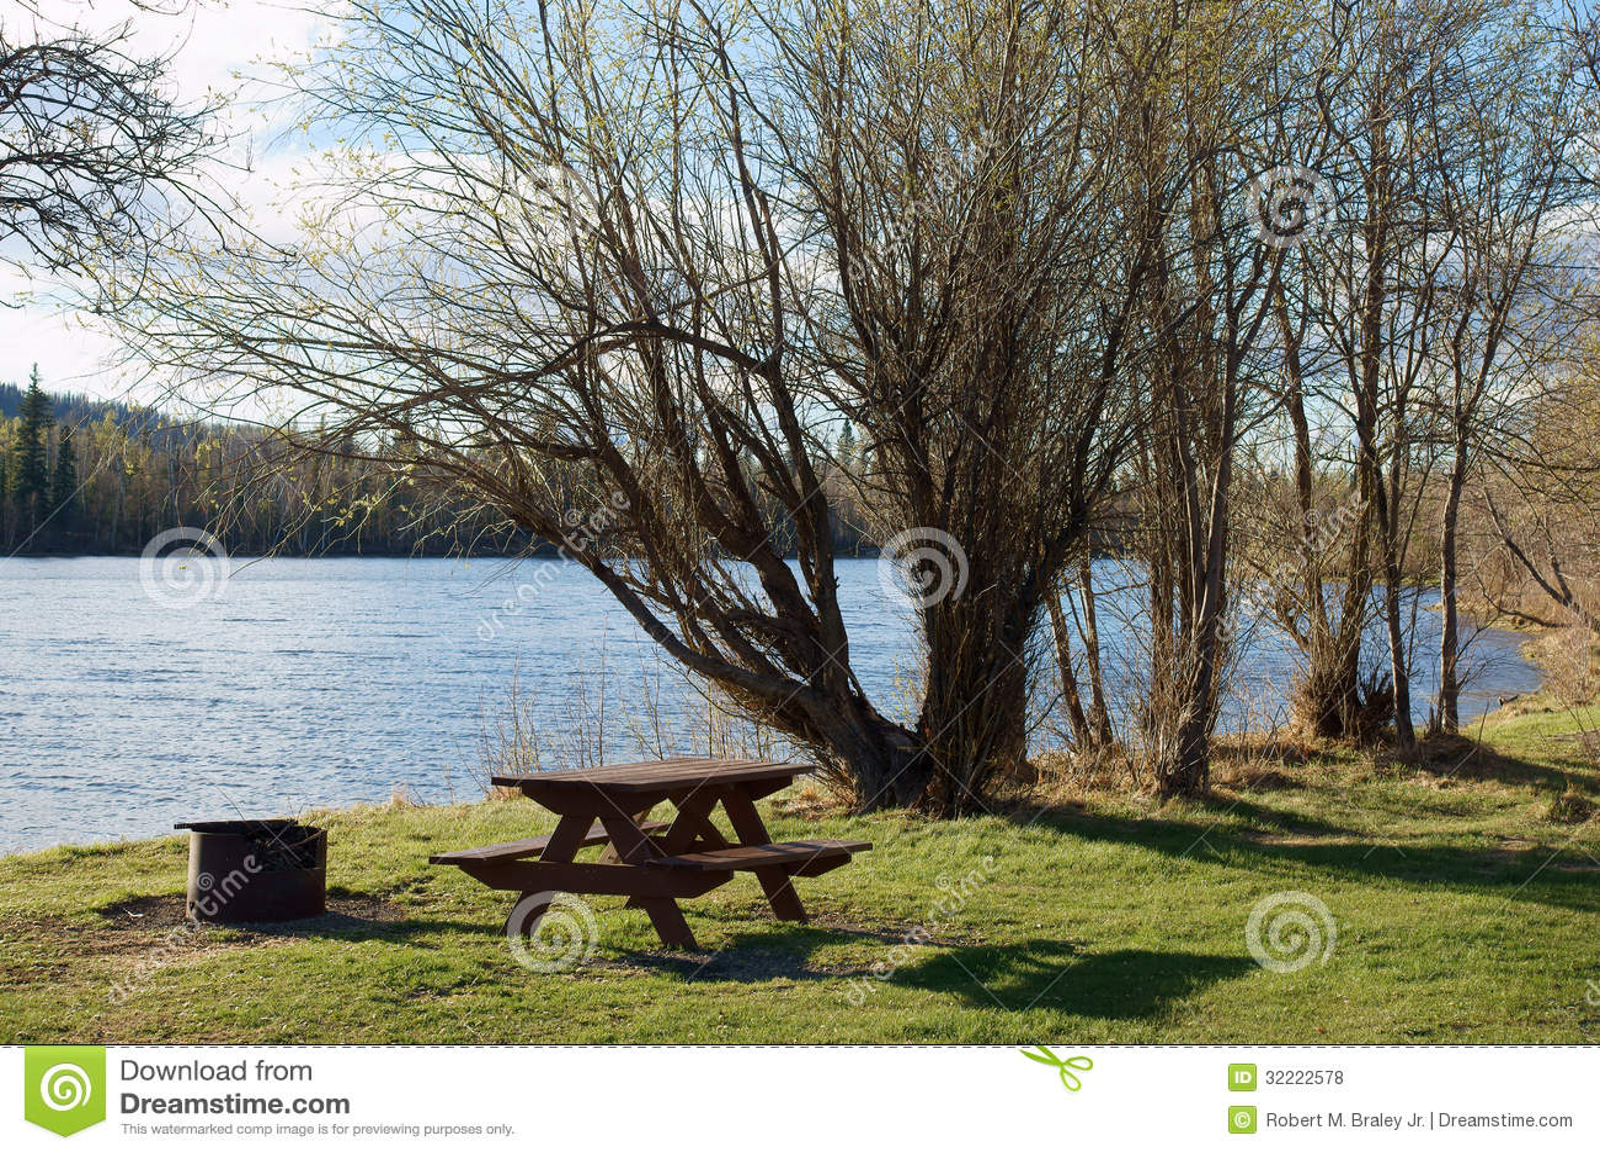 Download Lakeside Campsite stock photo. Image of campsite, campfire - 32222578